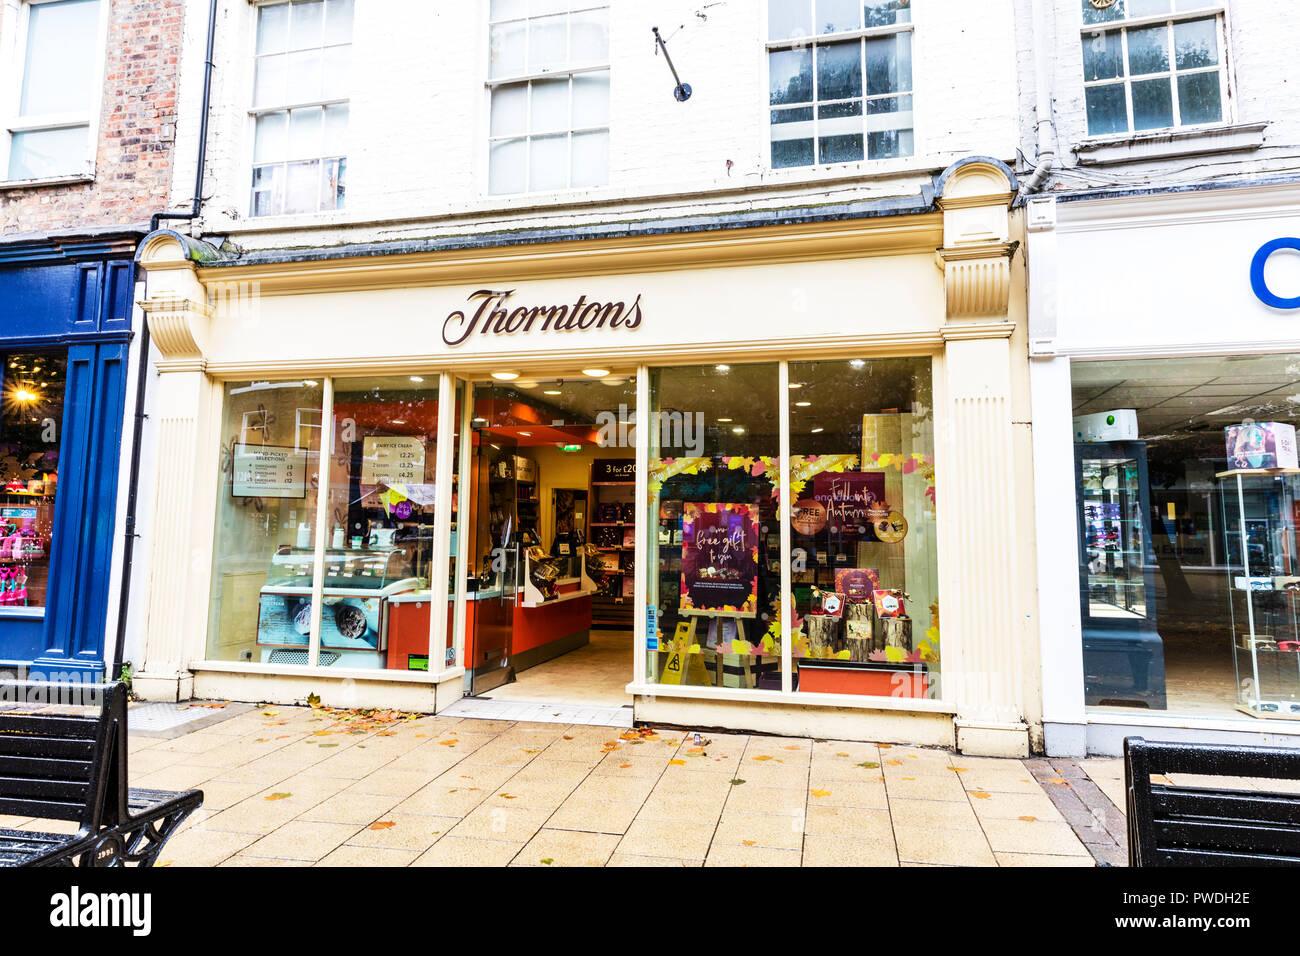 Thorntons Chocolate shop, Thorntons Chocolates, Thorntons Chocolate store, Thorntons Store, Thorntons sign, Thorntons, Chocolate, shop, store, UK - Stock Image